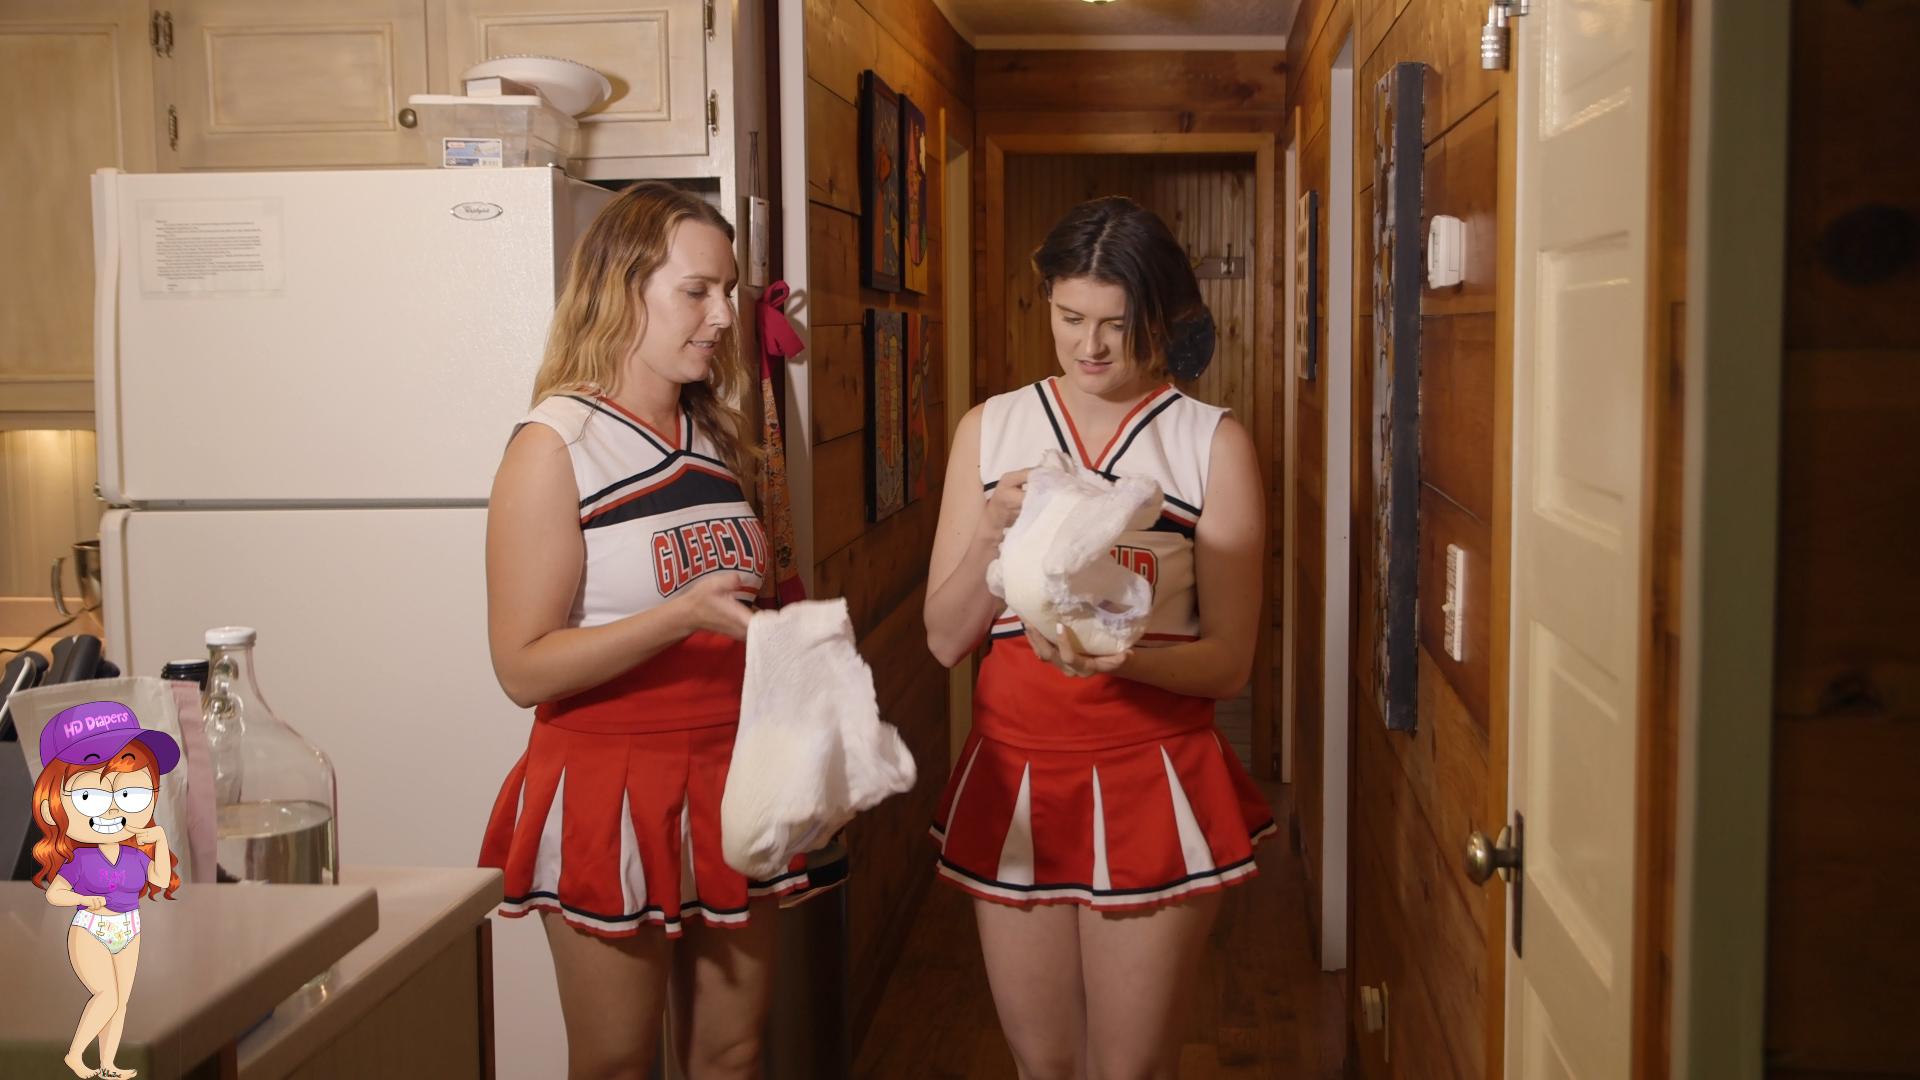 HD Diapers - Sexy women who love having fun in diapers